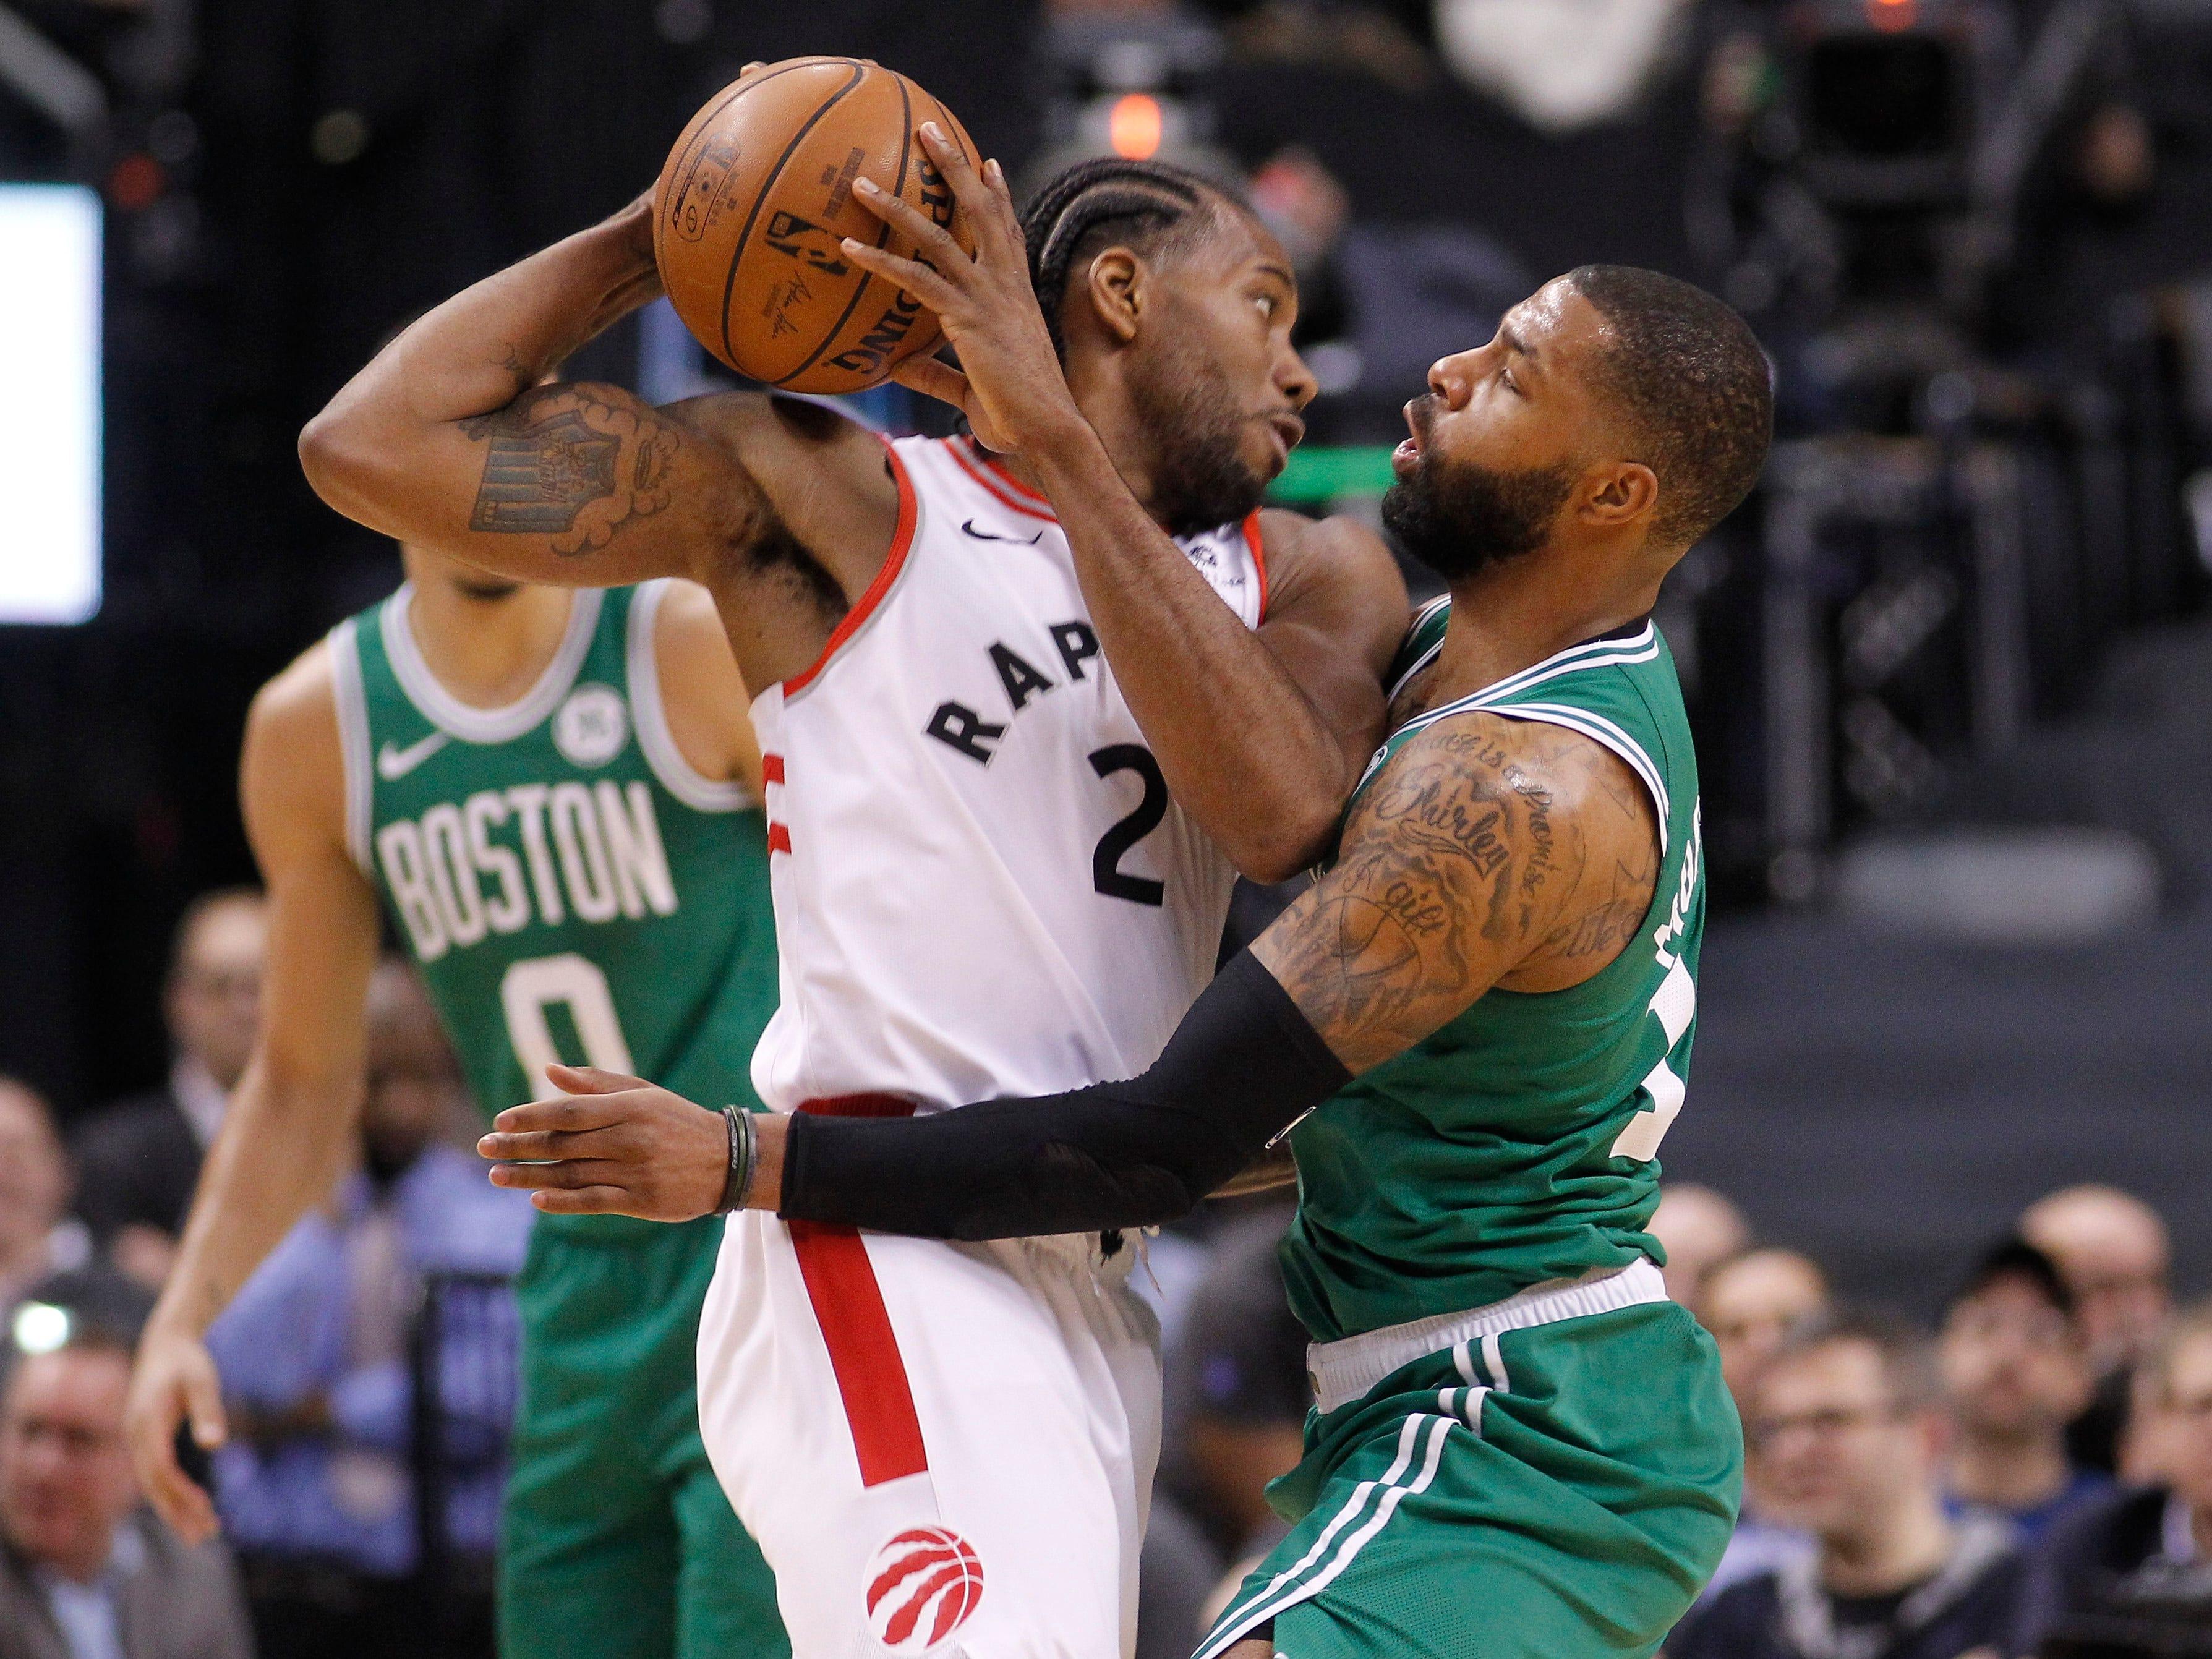 Feb. 26: Boston Celtics forward Marcus Morris pressures Toronto Raptors forward Kawhi Leonard at Scotiabank Arena. Toronto defeated Boston, 118-95.